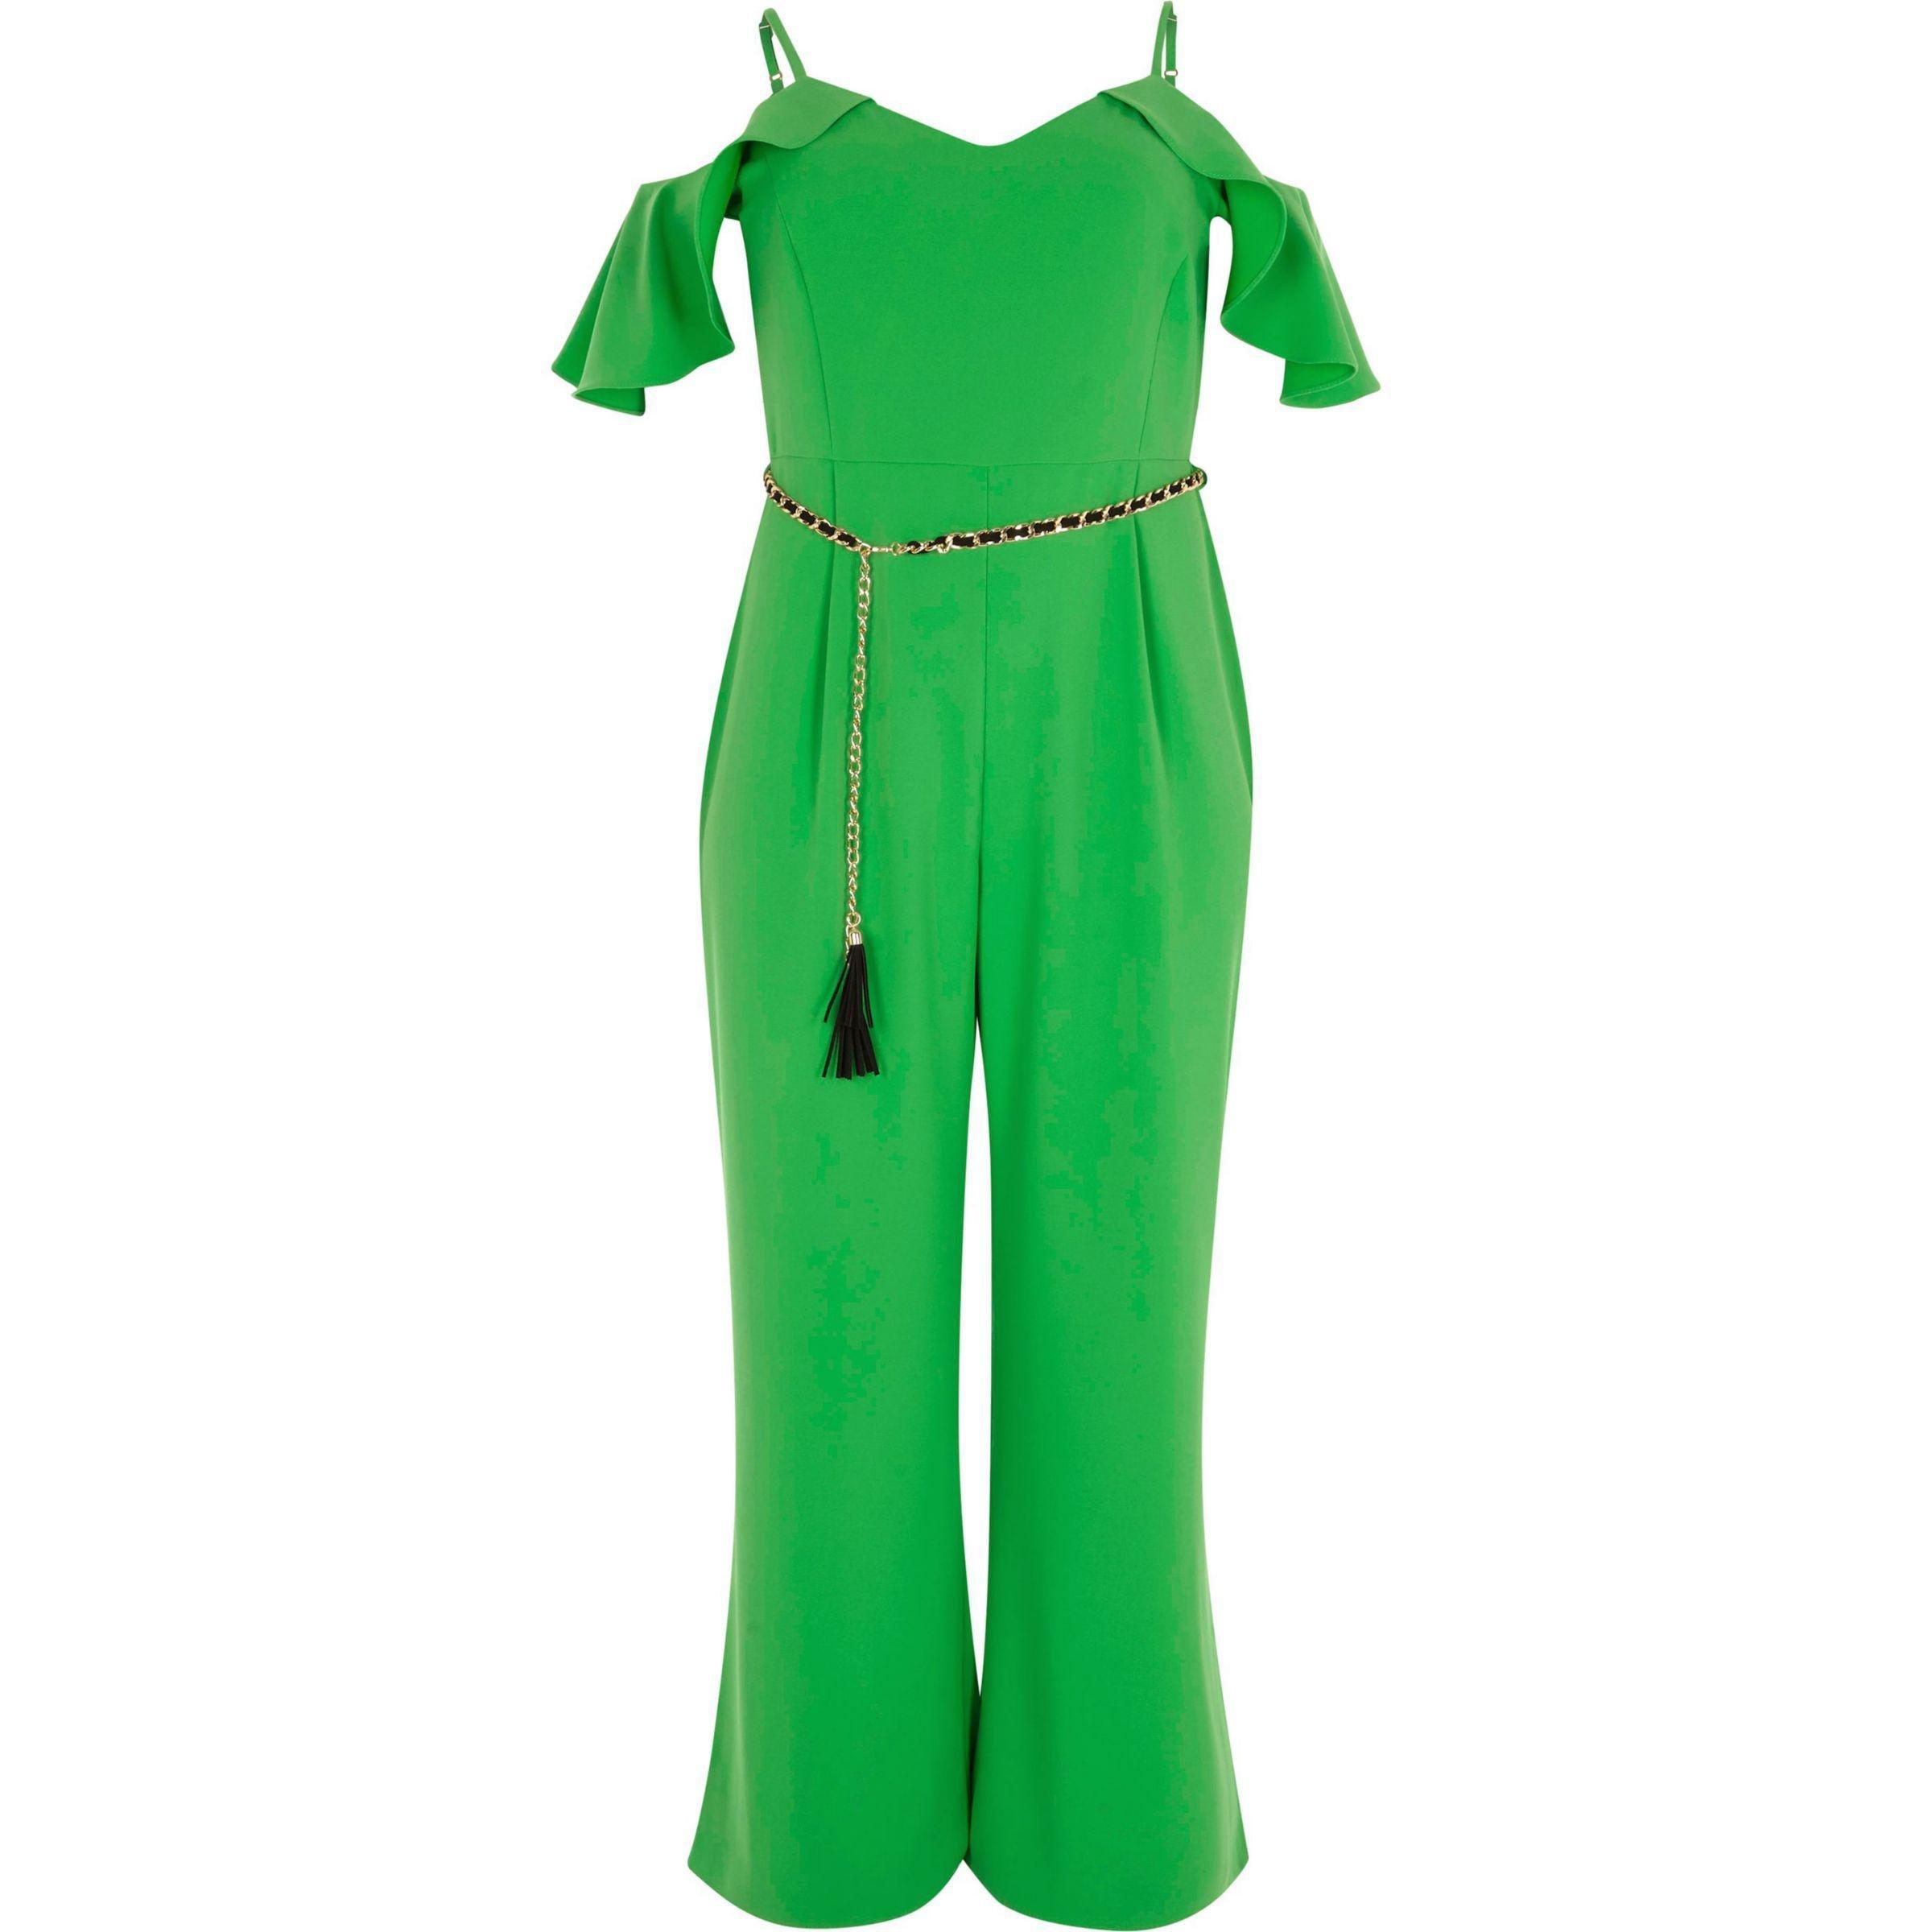 398a6ae8b602 Lyst - River Island Plus Green Frill Sleeve Bardot Jumpsuit in Green